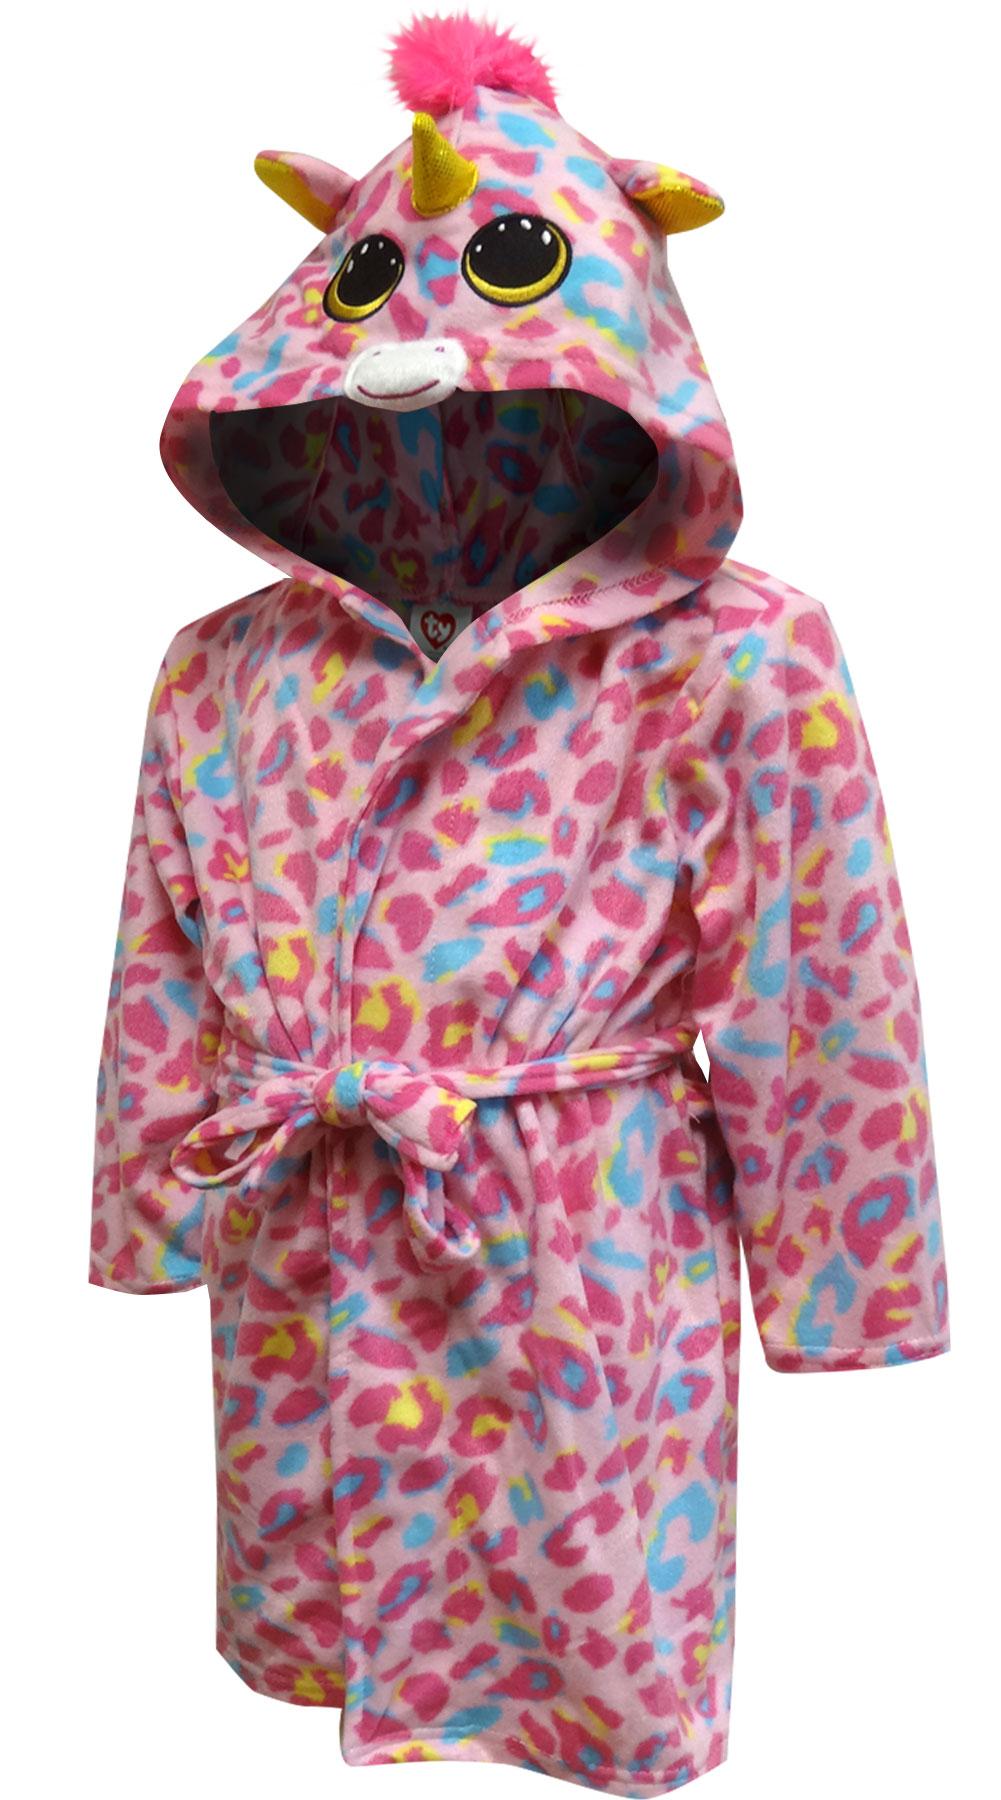 Image of Ty Beanie Boo Unicorn Fantasia Robe for girls